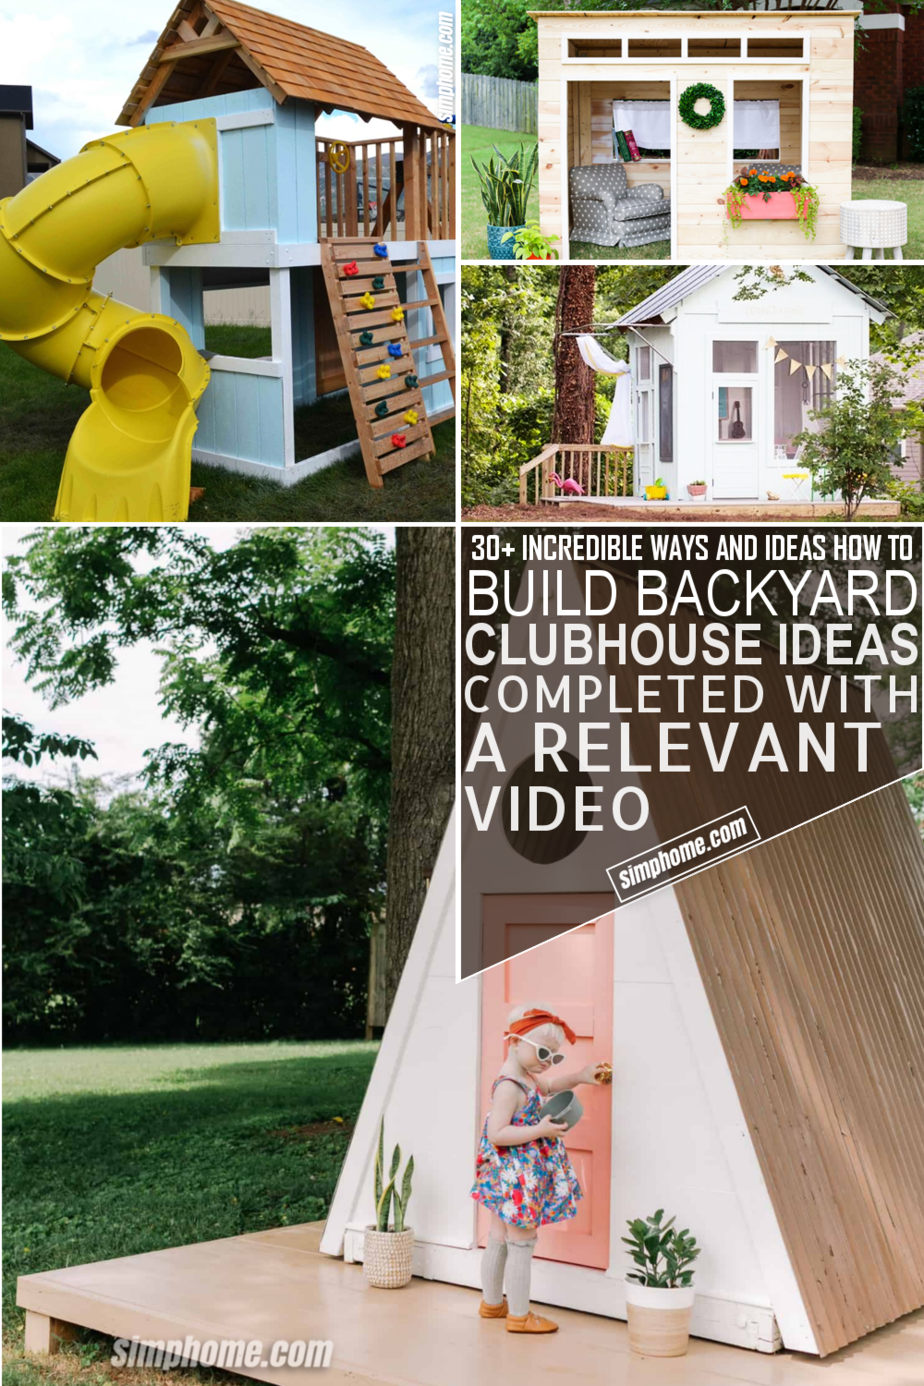 30 Ways of How to Build Backyard Clubhouse Ideas via Simphome.com